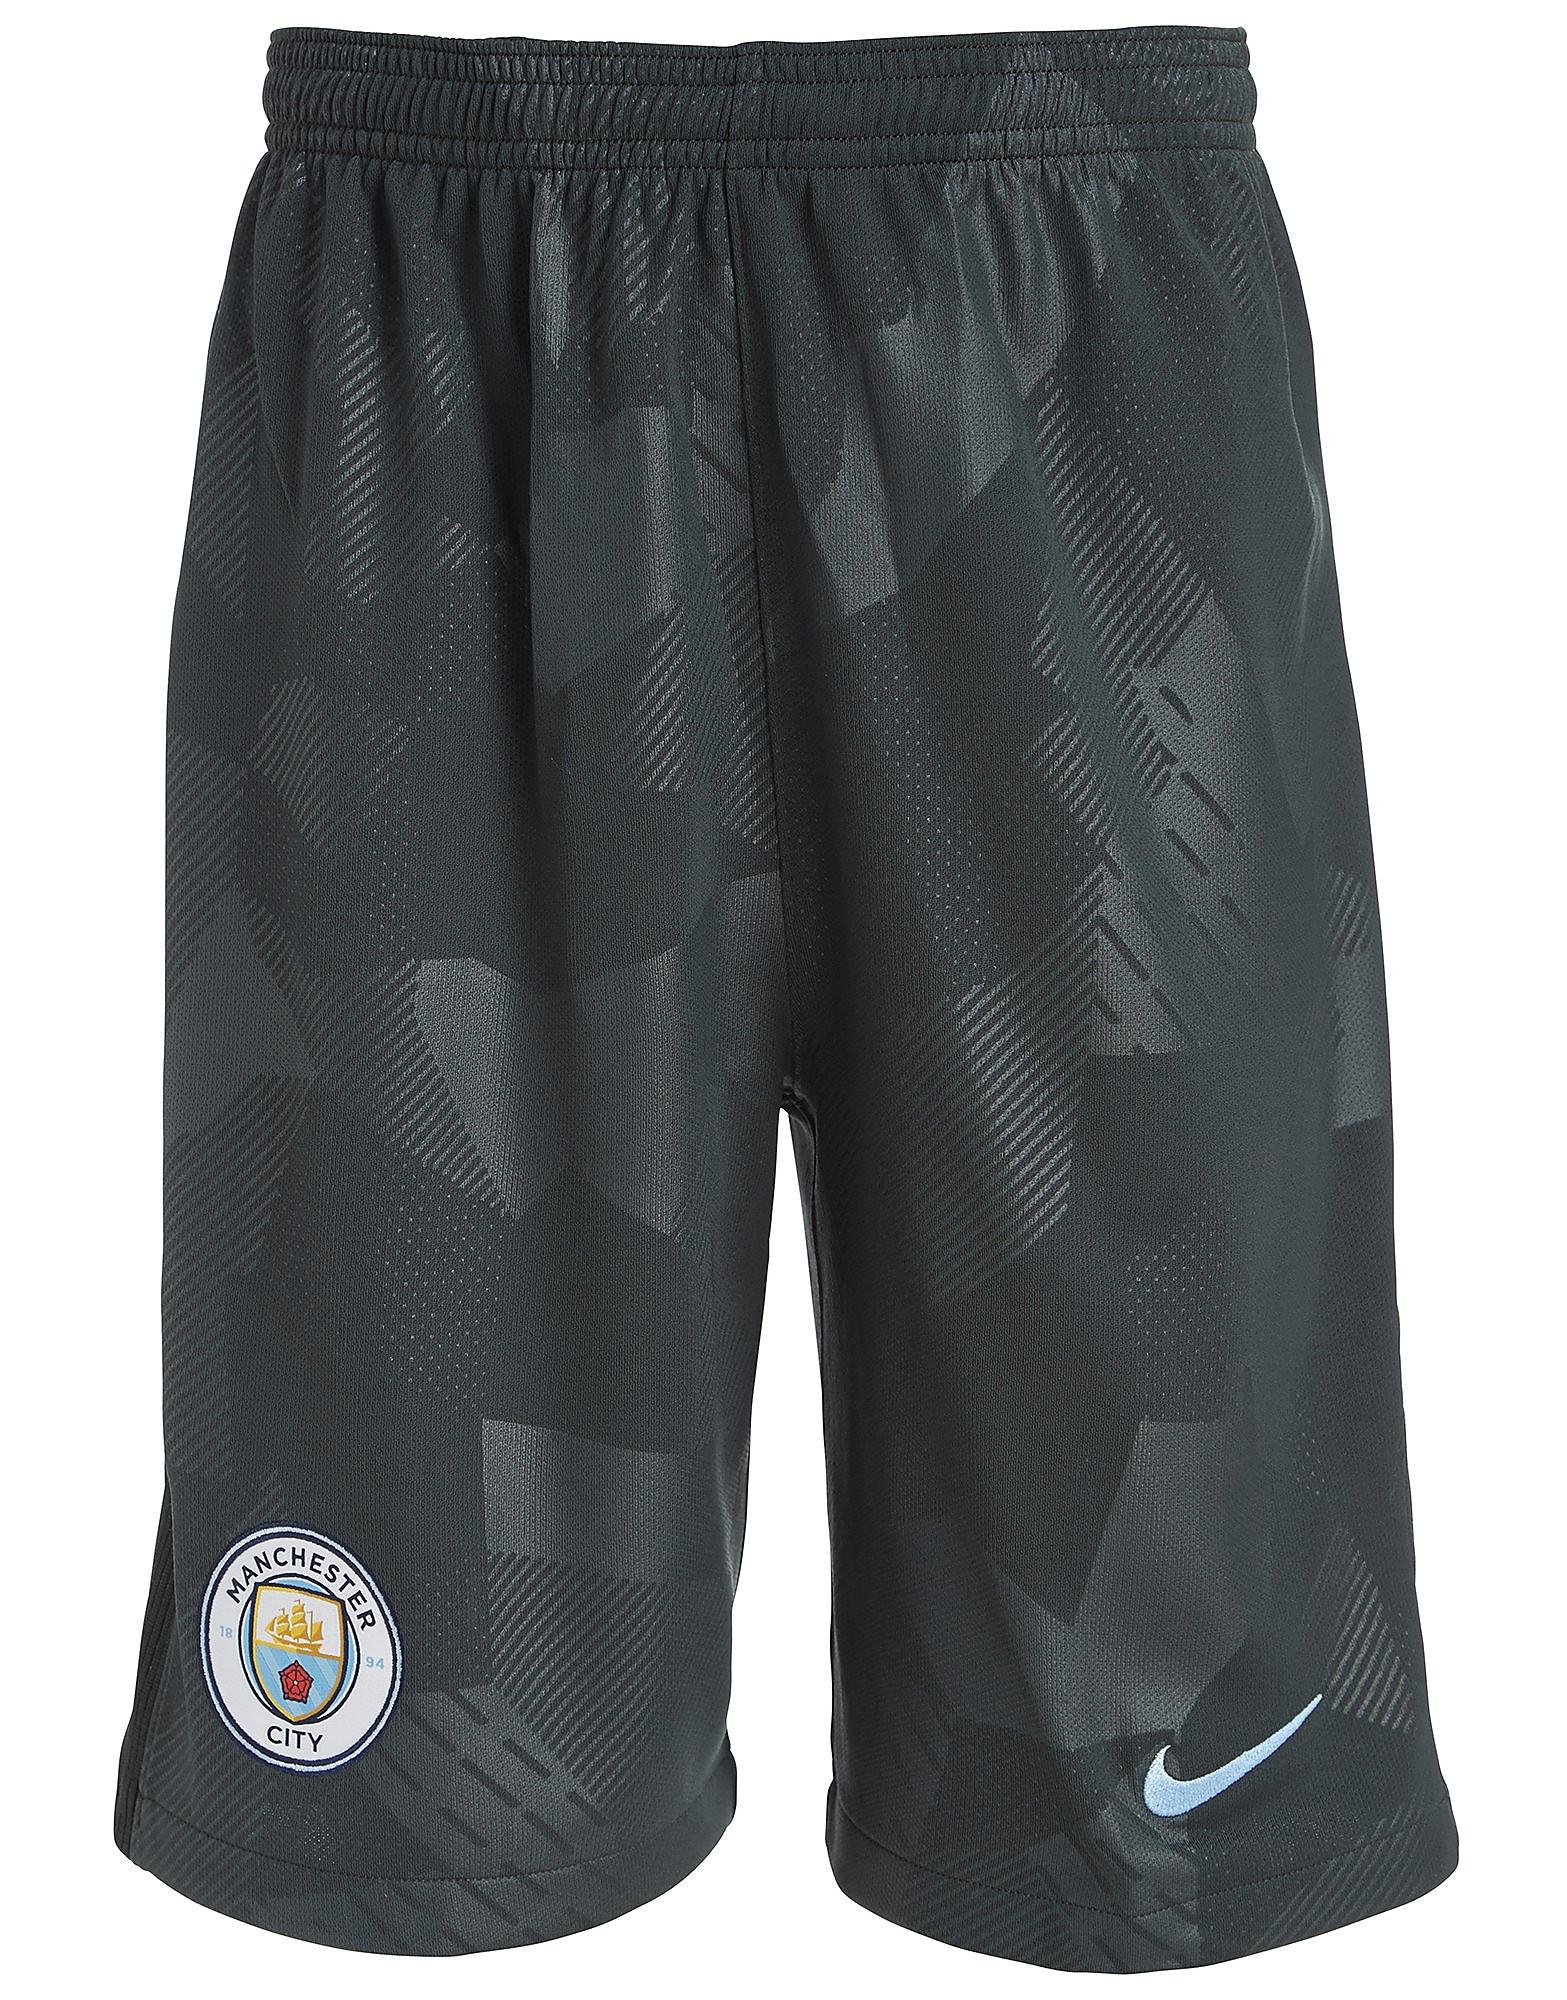 Nike Manchester City FC 2017/18 Third Shorts Junior